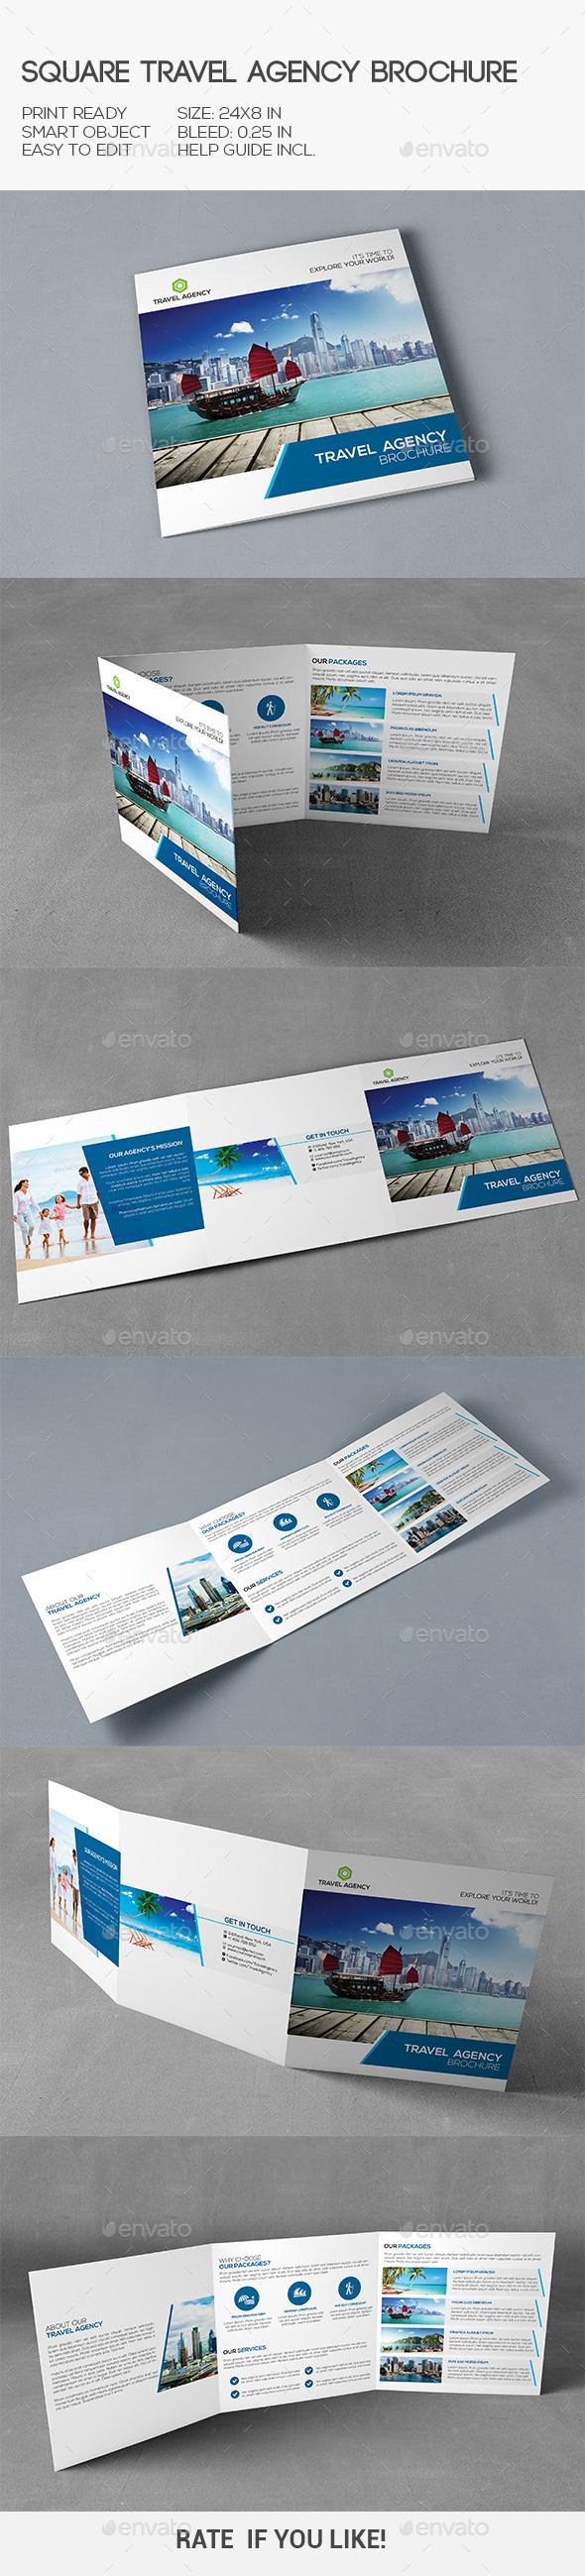 Travel Agency Square Brochure - Corporate Brochures